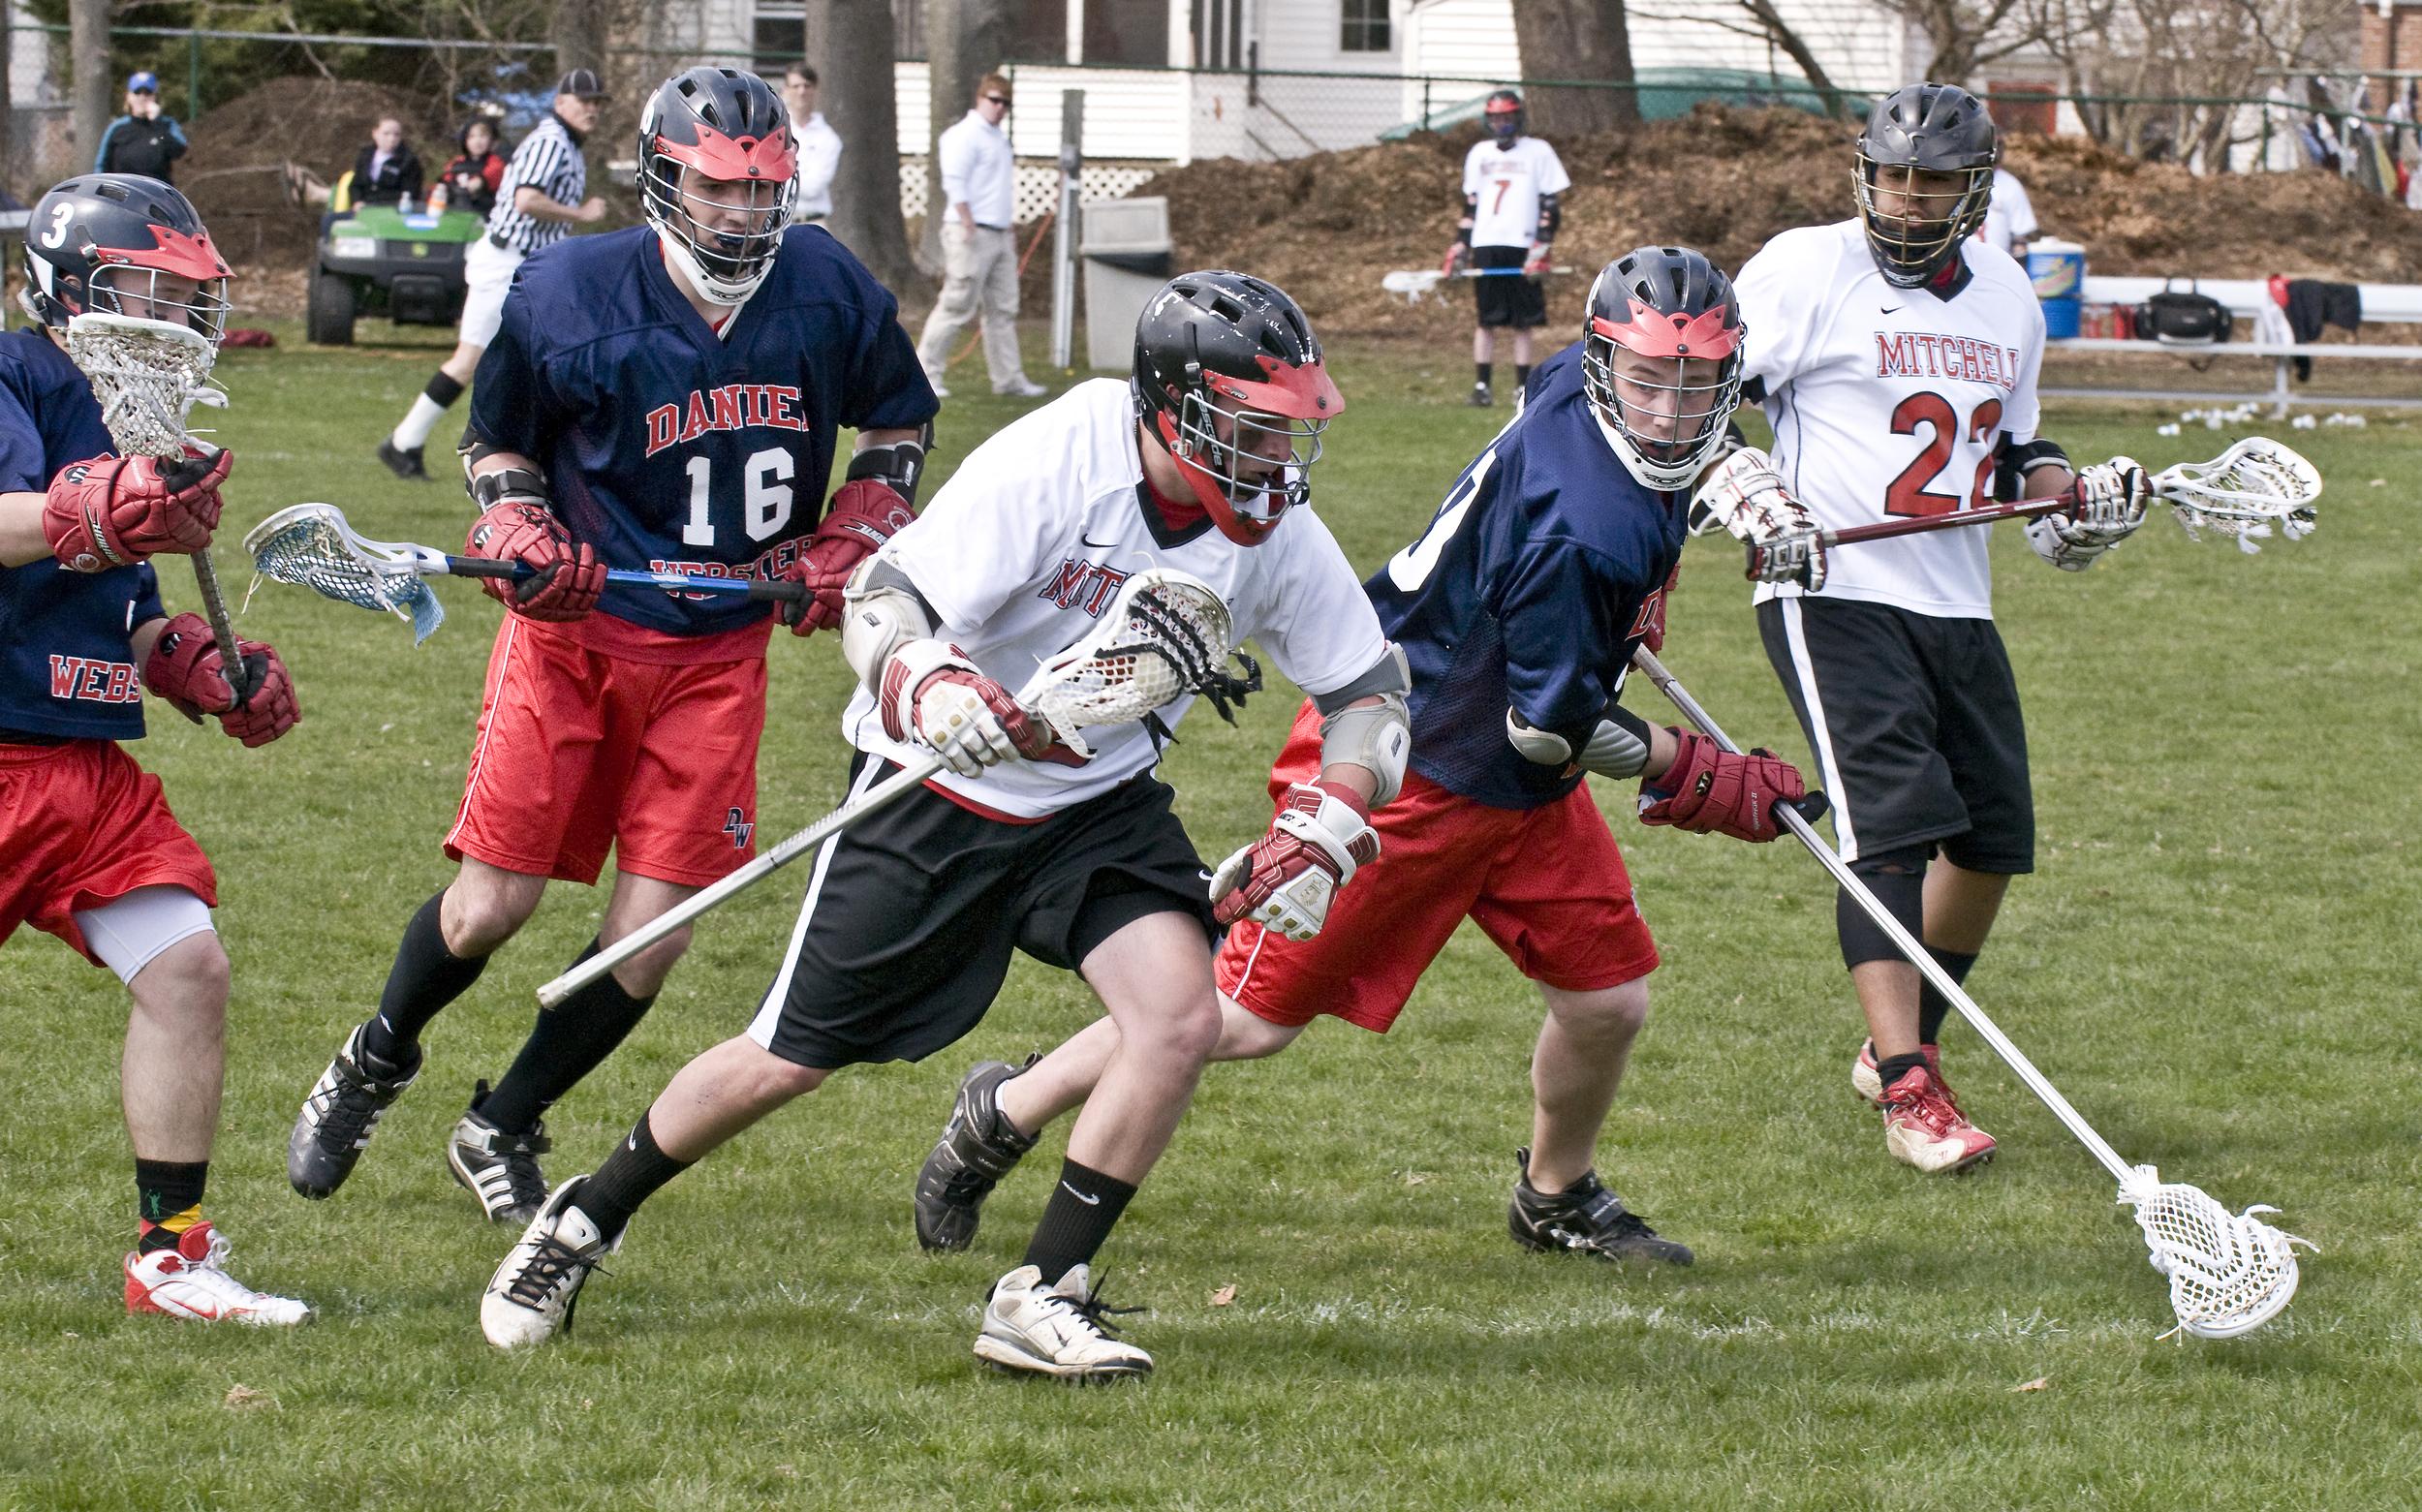 Mitchell College Lacrosse